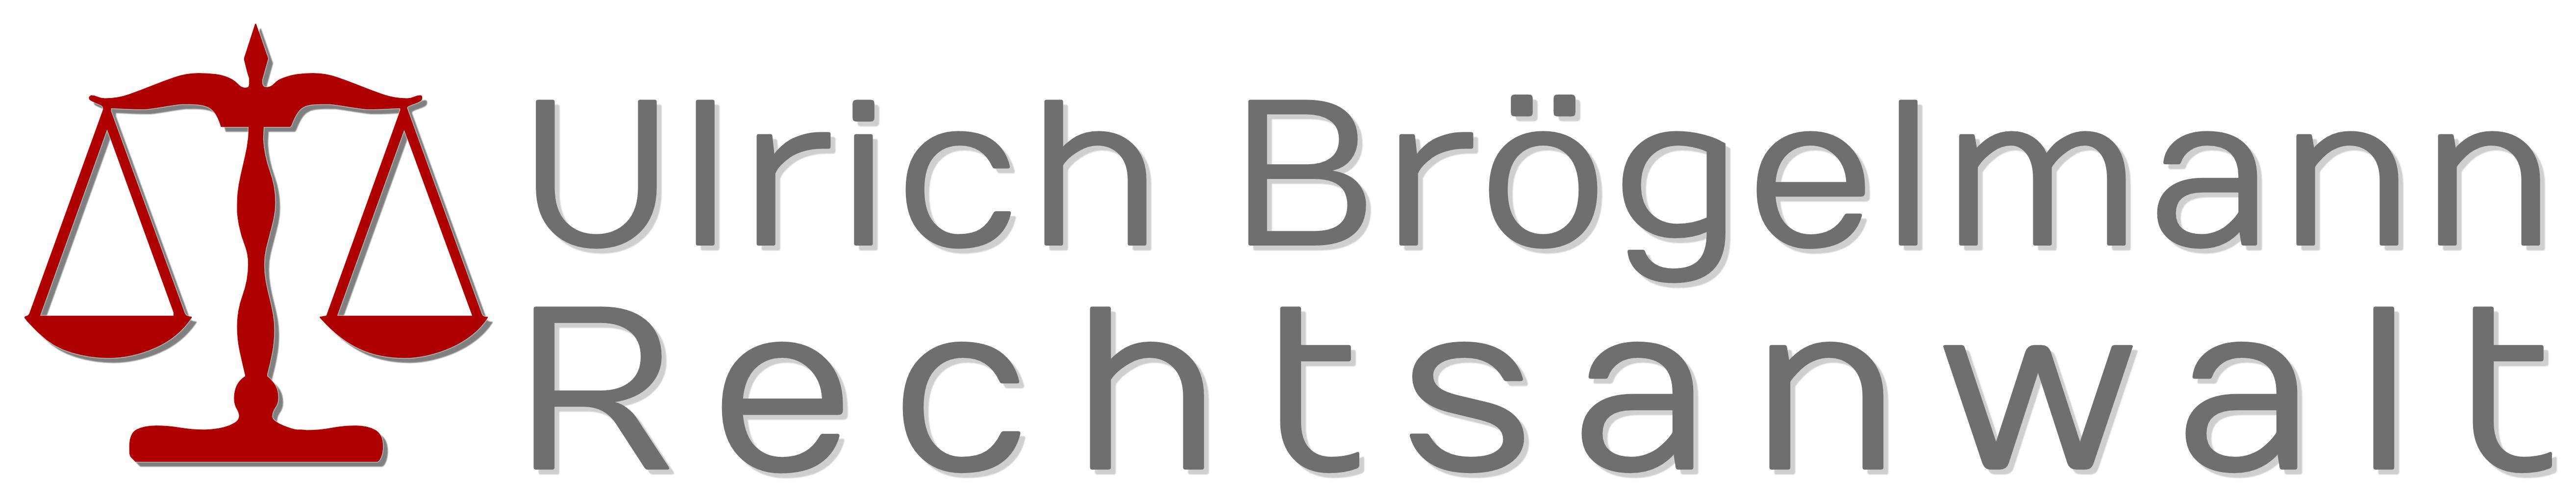 Rechtsanwalt Ulrich Brögelmann | Ihr Anwalt in Bergisch Gladbach für Arbeitsrecht, Familienrecht, Medizinrecht, Mietrecht, Verkehrsrecht und Zivilrecht